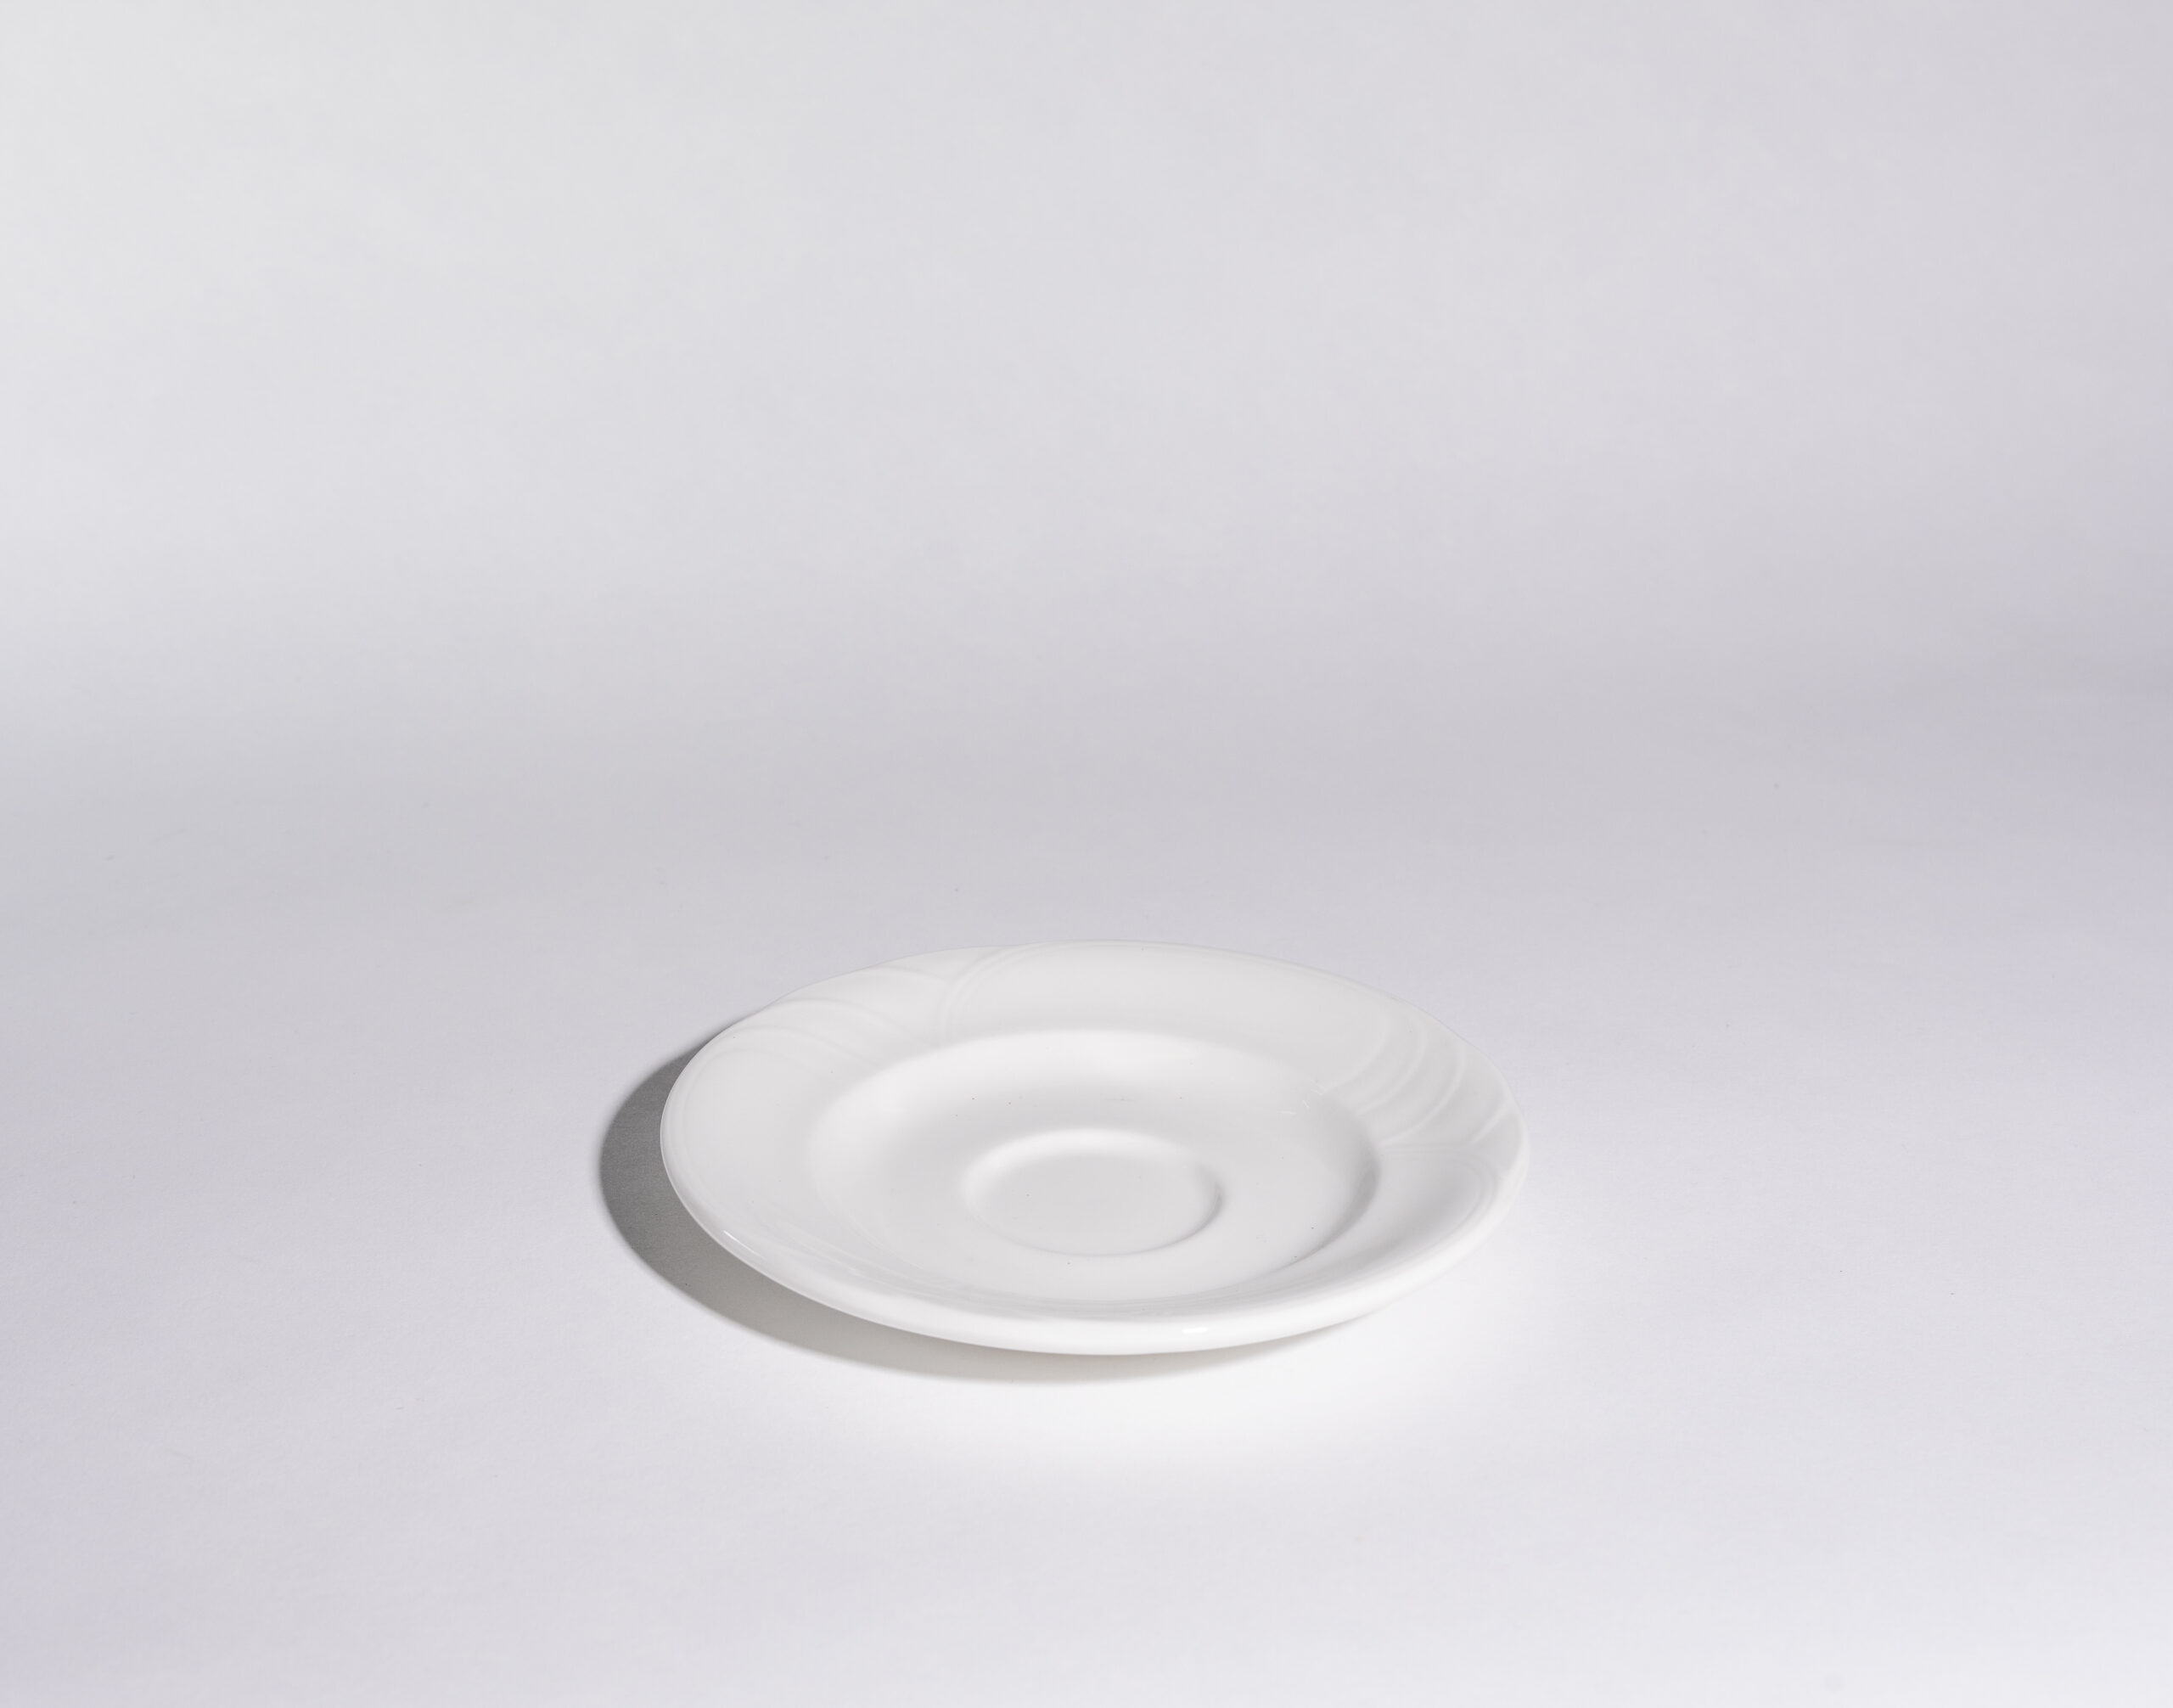 Coffee/consommé saucers